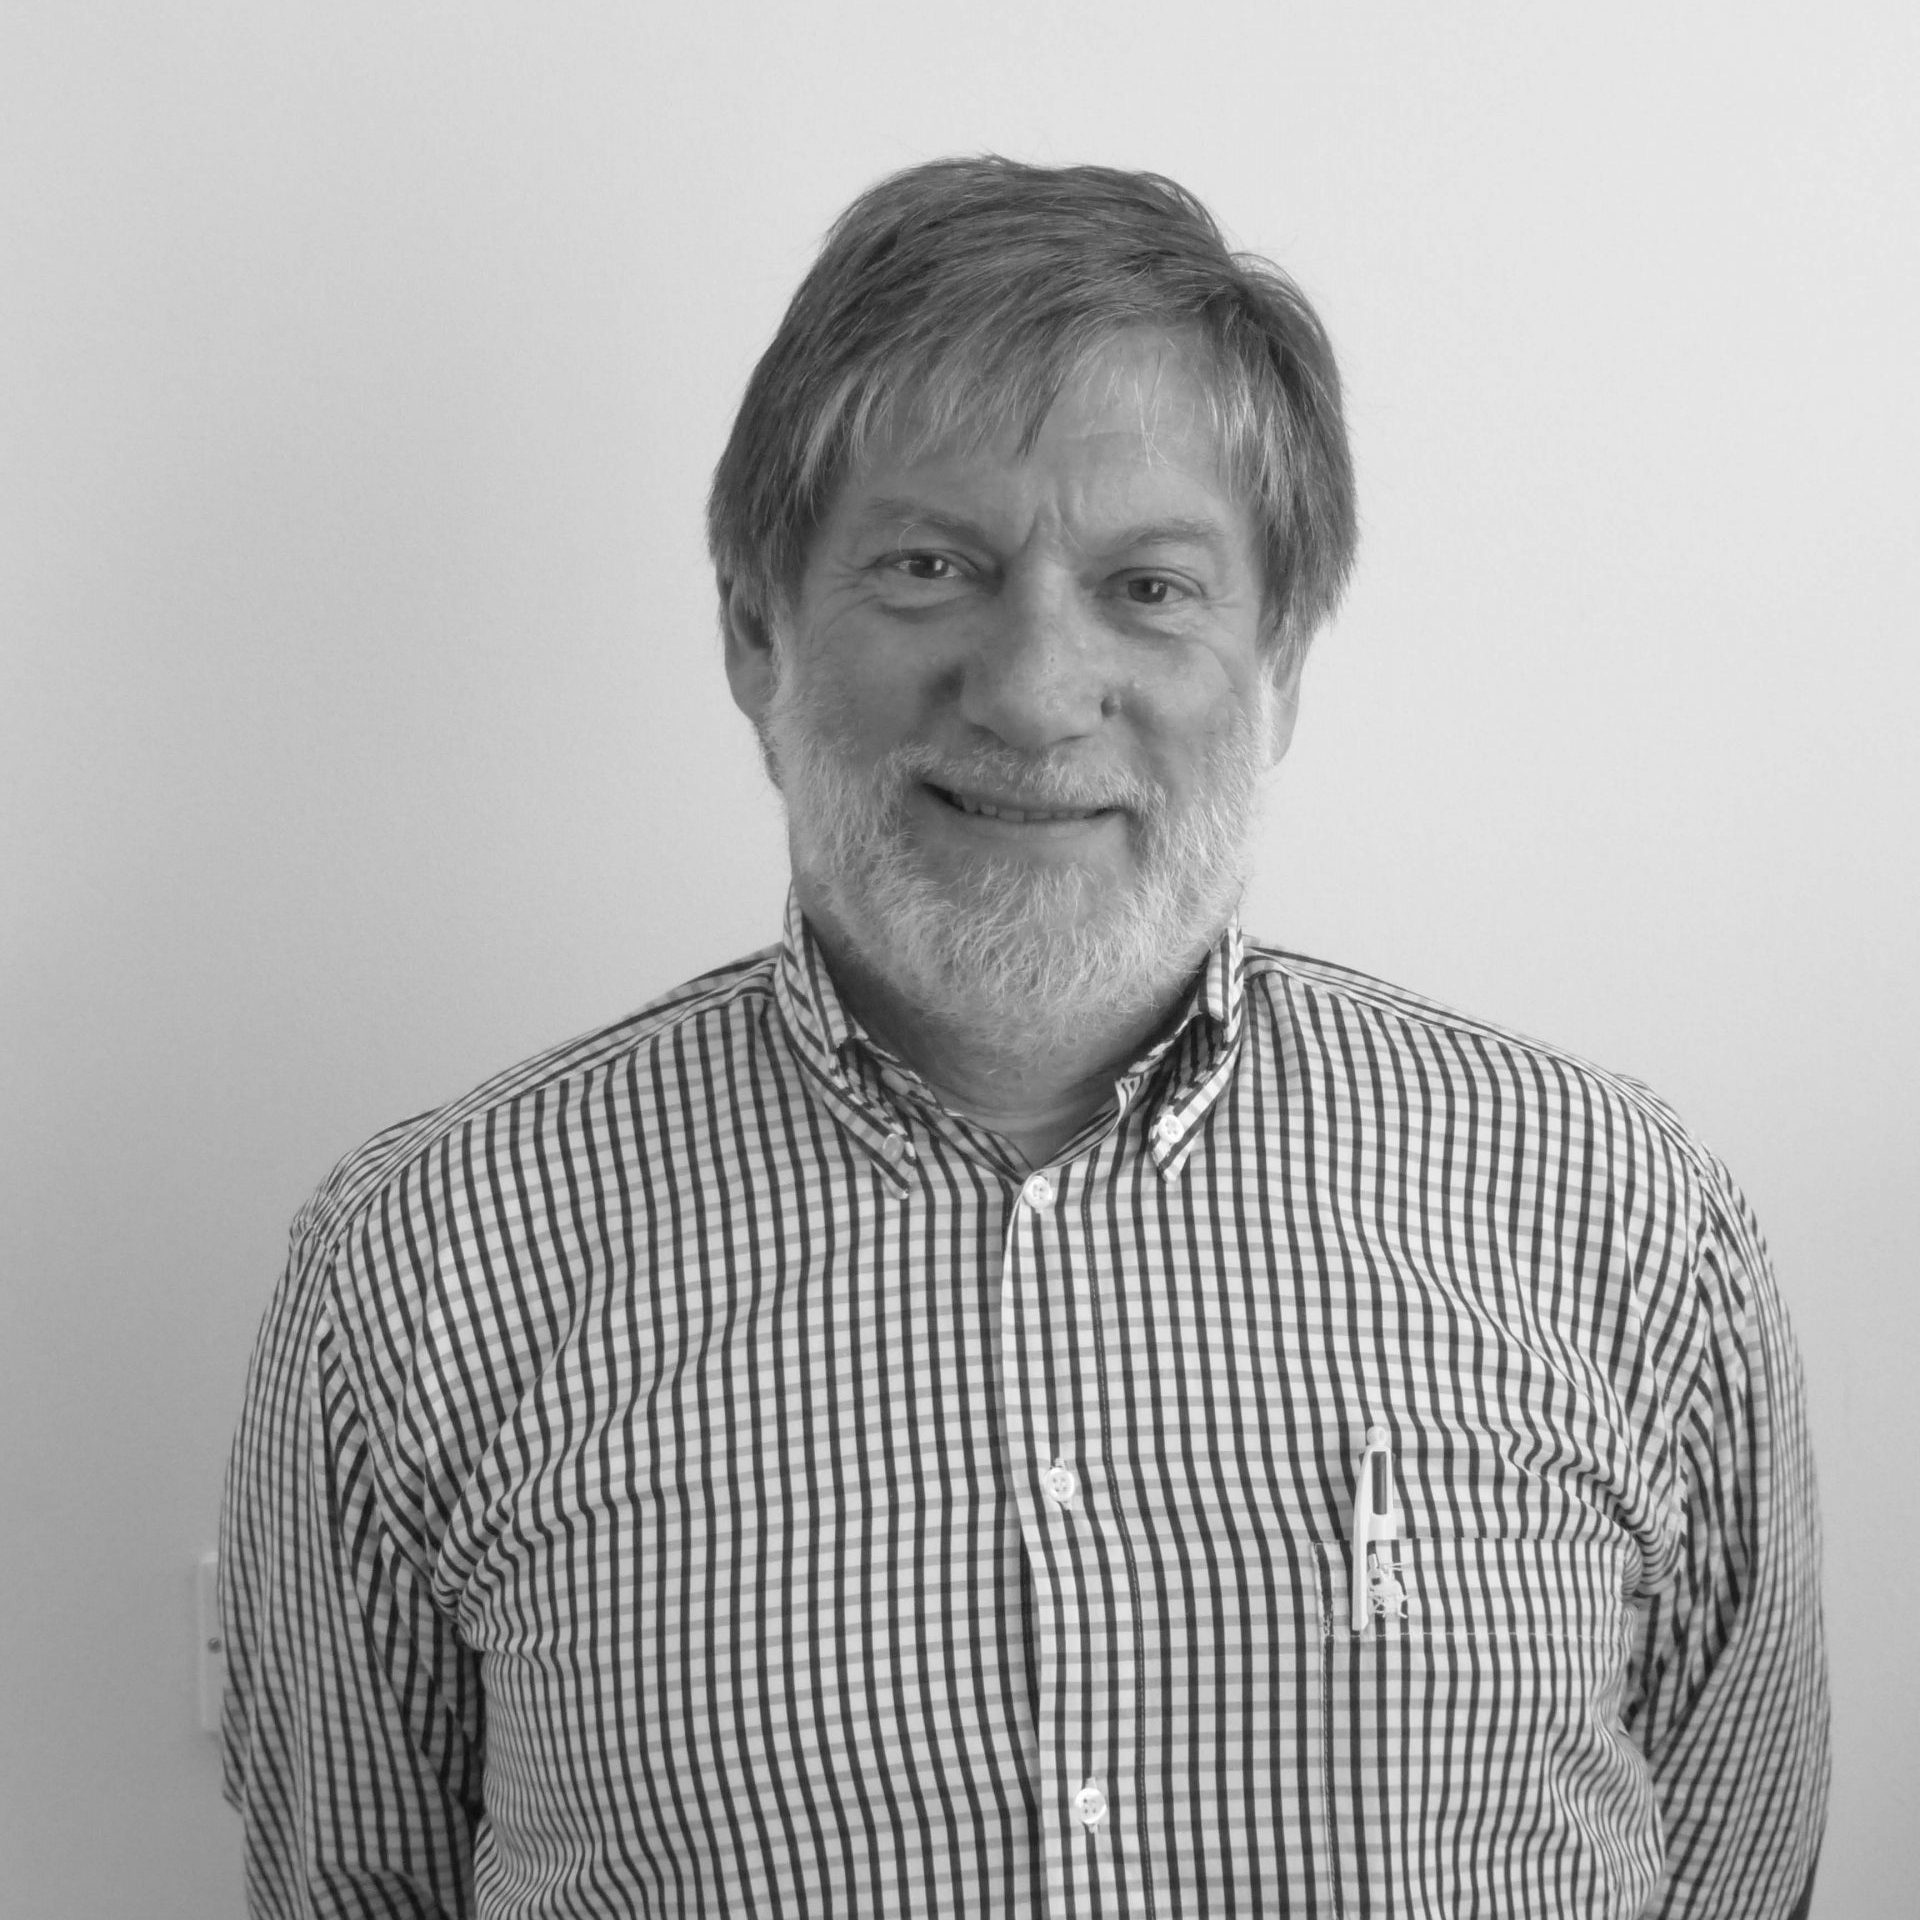 Philippe Jégou